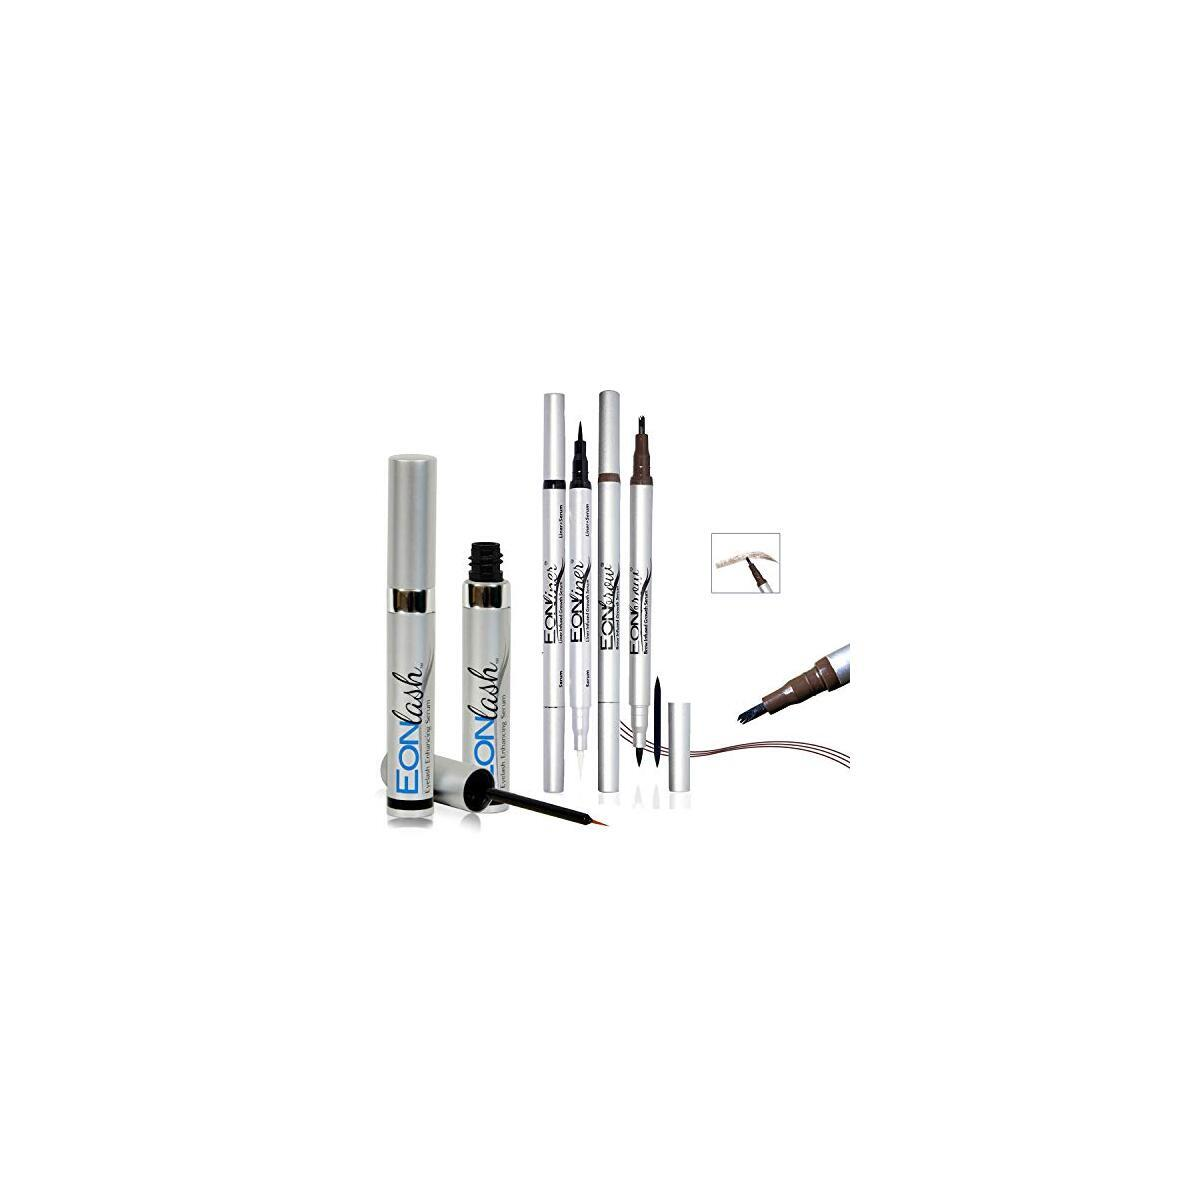 Dual Tip Liquid Eyeliner and Eyebrow Enhancer - Long Lasting | Super Slim | Ultra-Fine Felt Tip Liquid Pen Waterproof Smudge Proof Perfect Makeup, Quick Drying Formula with Eyelash Growth Serum